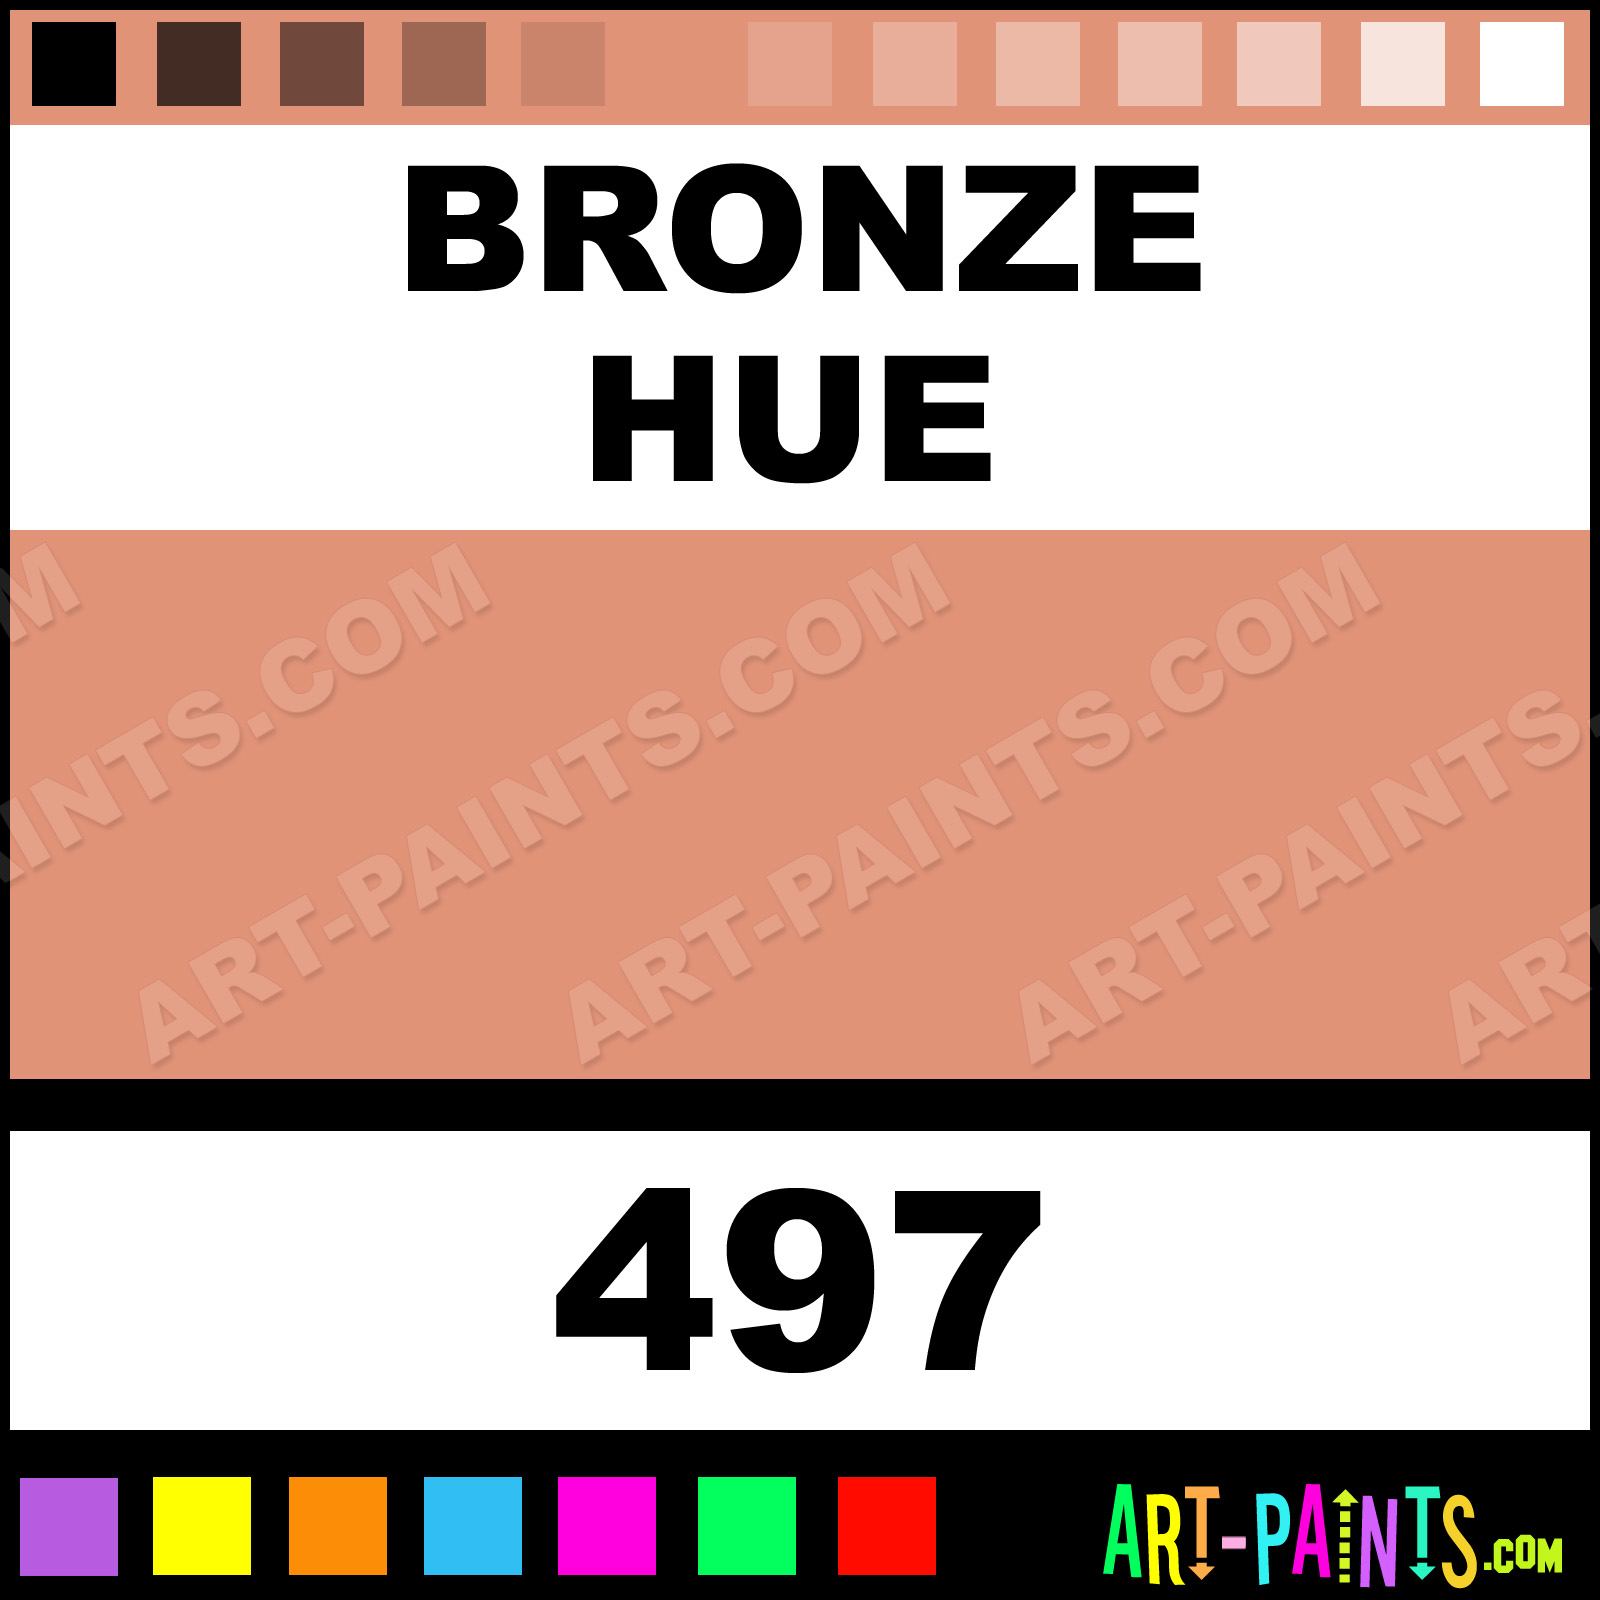 Bronze Metallic Acrylic Paints - 497 - Bronze Paint. Bronze Color. Caran D-Ache Metallic Paint. E19377 - Art-Paints.com